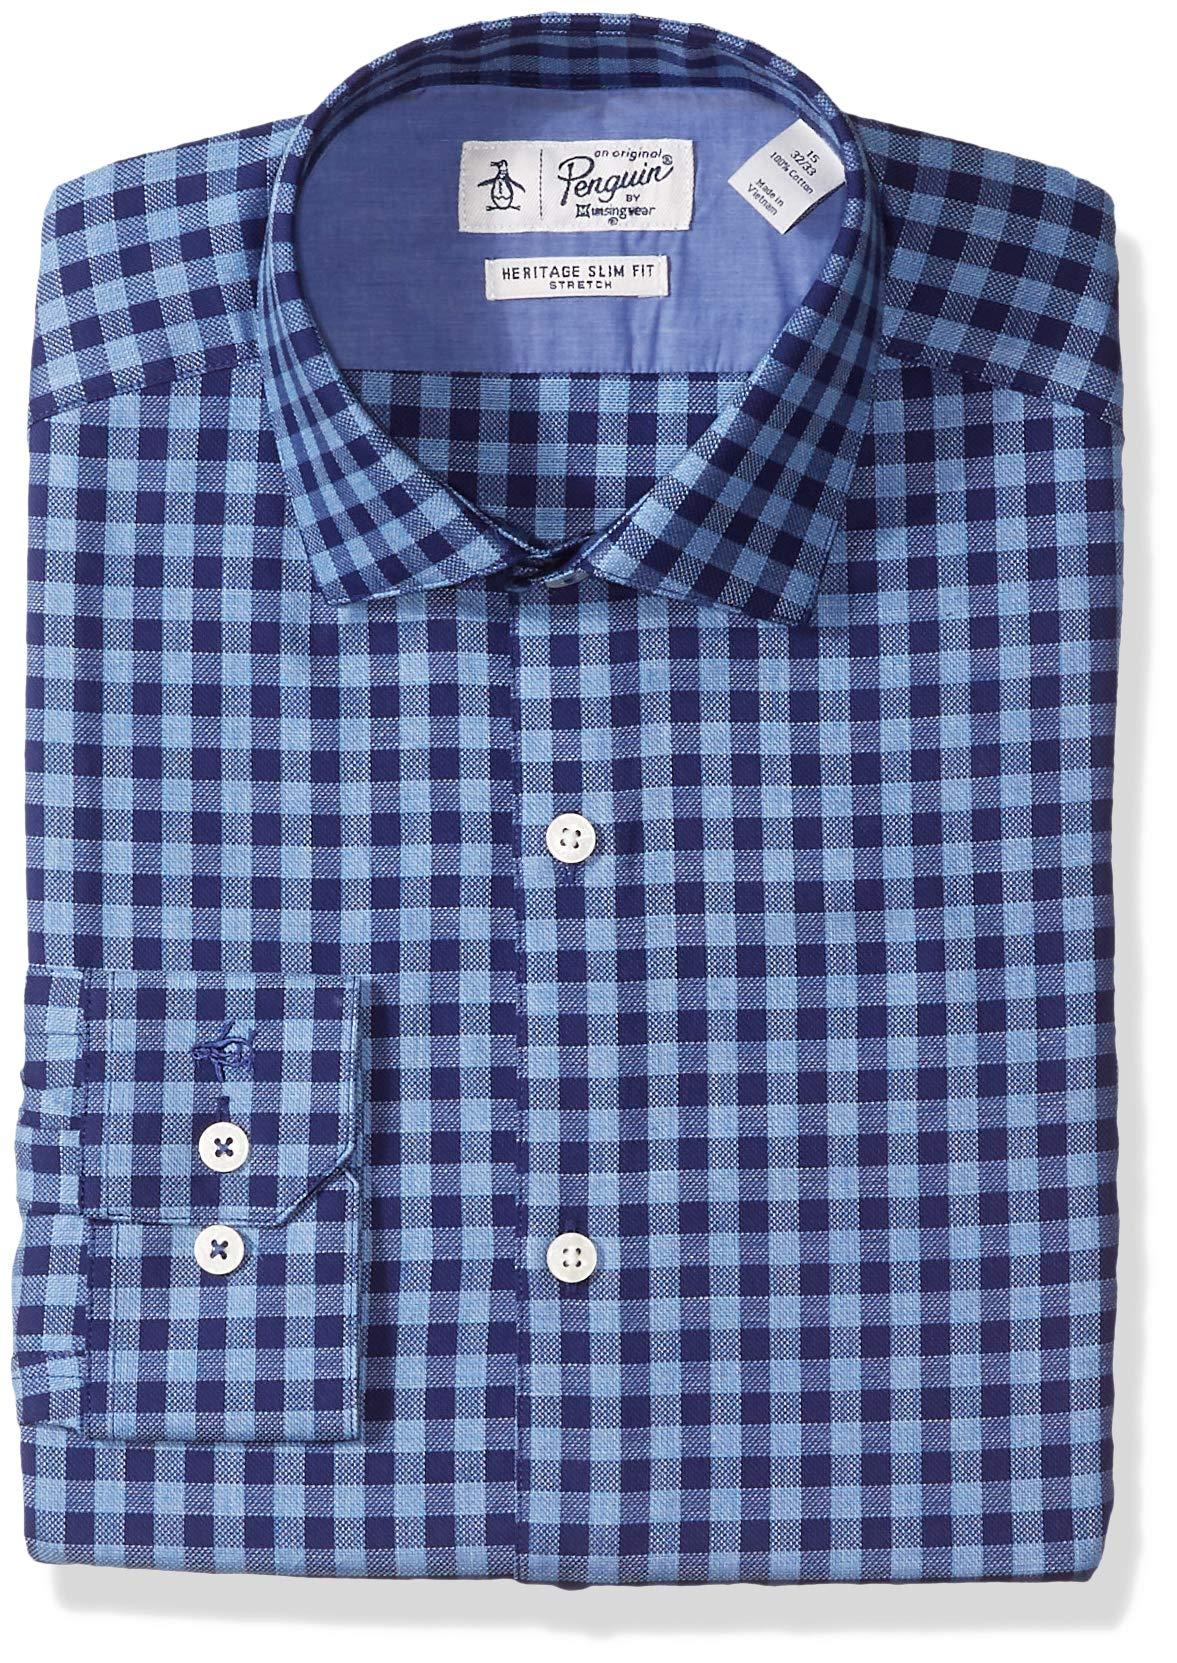 Original Penguin Men's Slim Fit Stretch Gingham Dress Shirt, Blue Gingham, 16 34/35